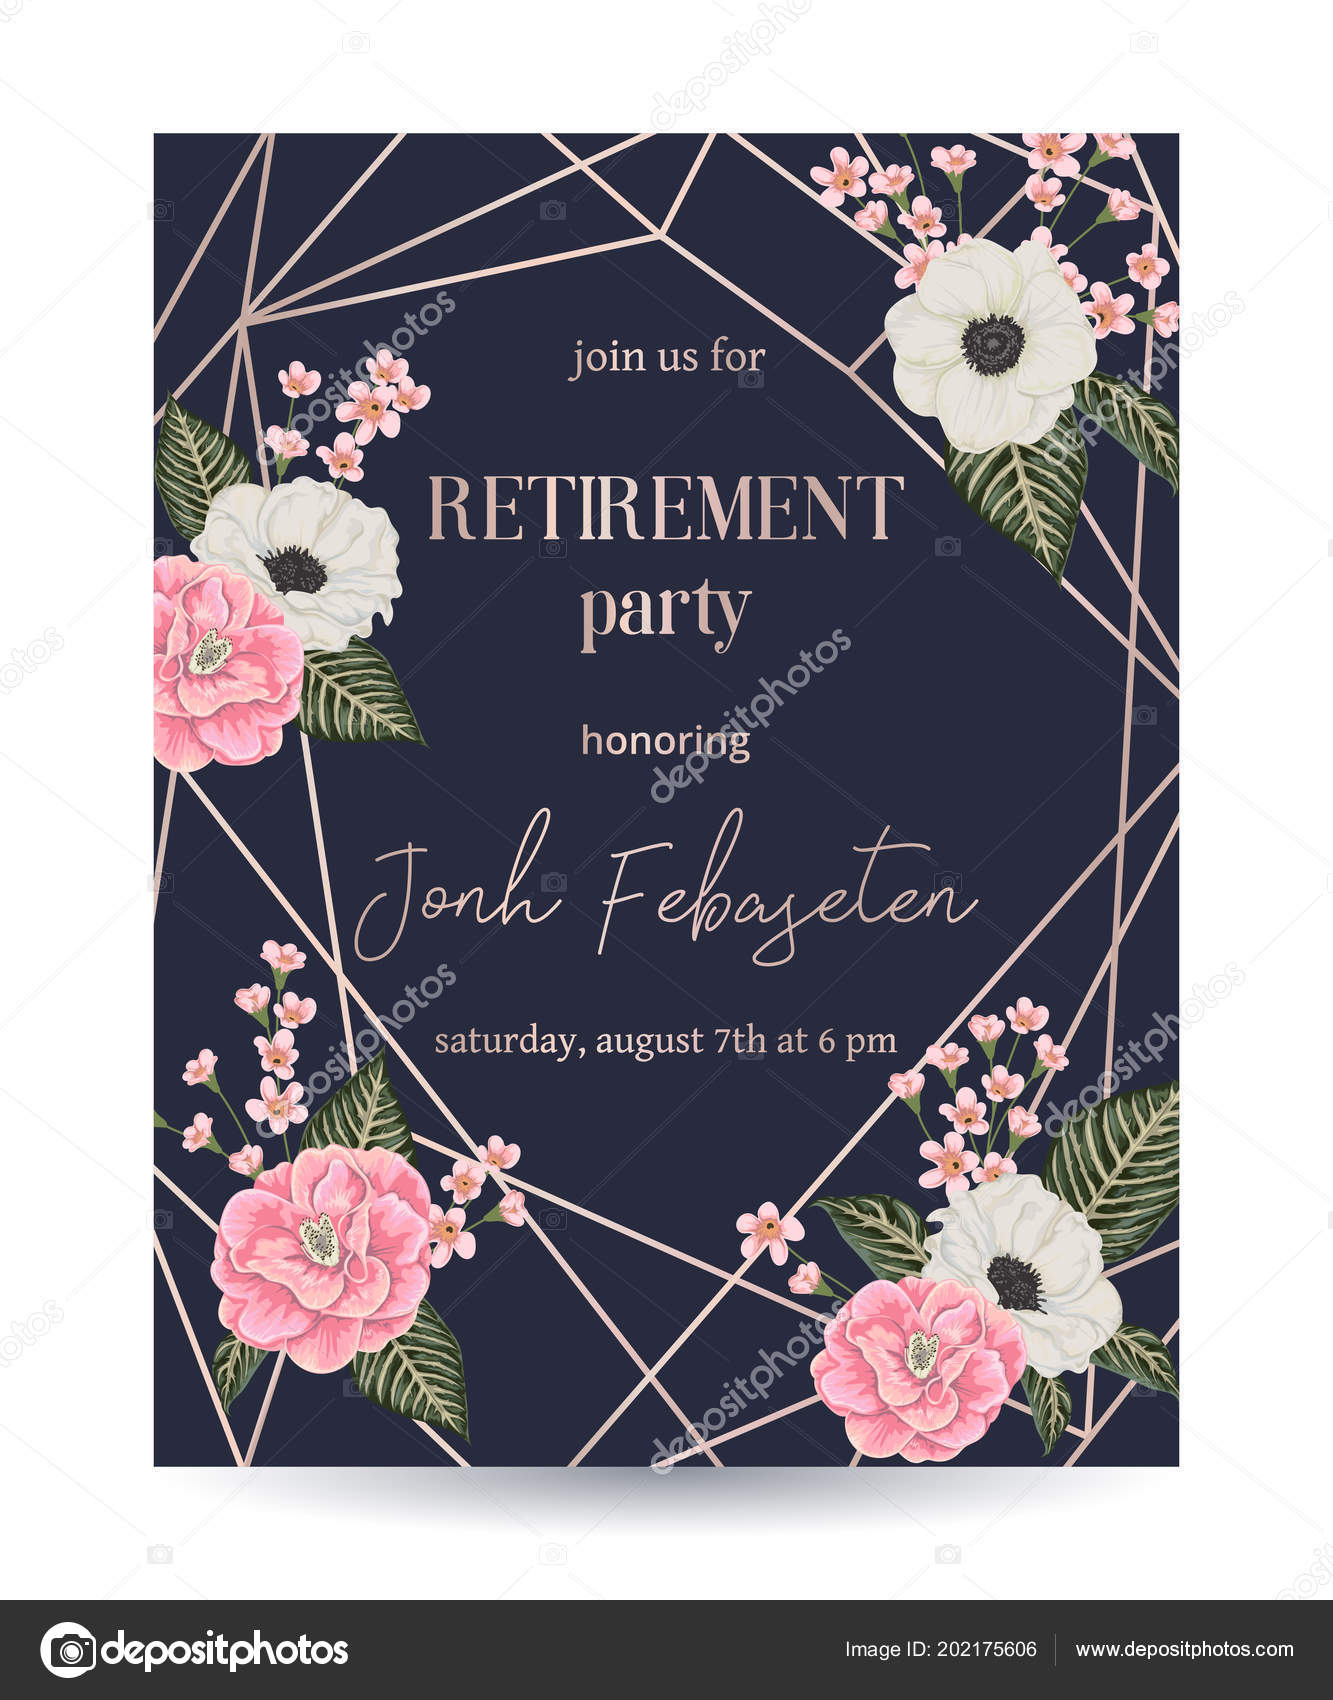 Retirement party invitation design template rose gold polygonal retirement party invitation design template rose gold polygonal frame floral vetores de stock stopboris Images